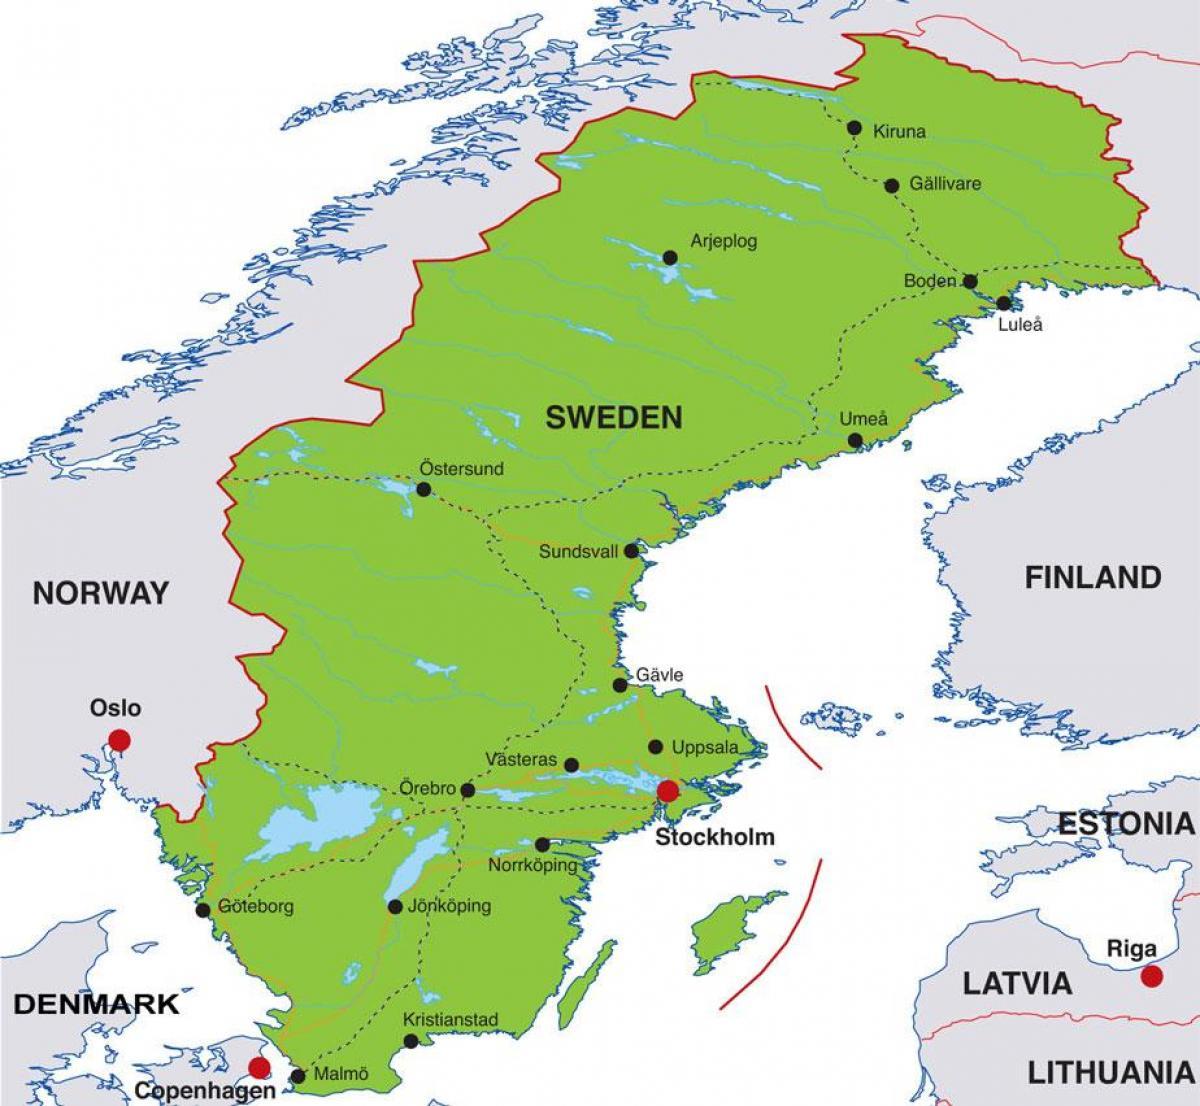 Paakaupunki Ruotsi Kartta Paakaupunki Ruotsi Kartta